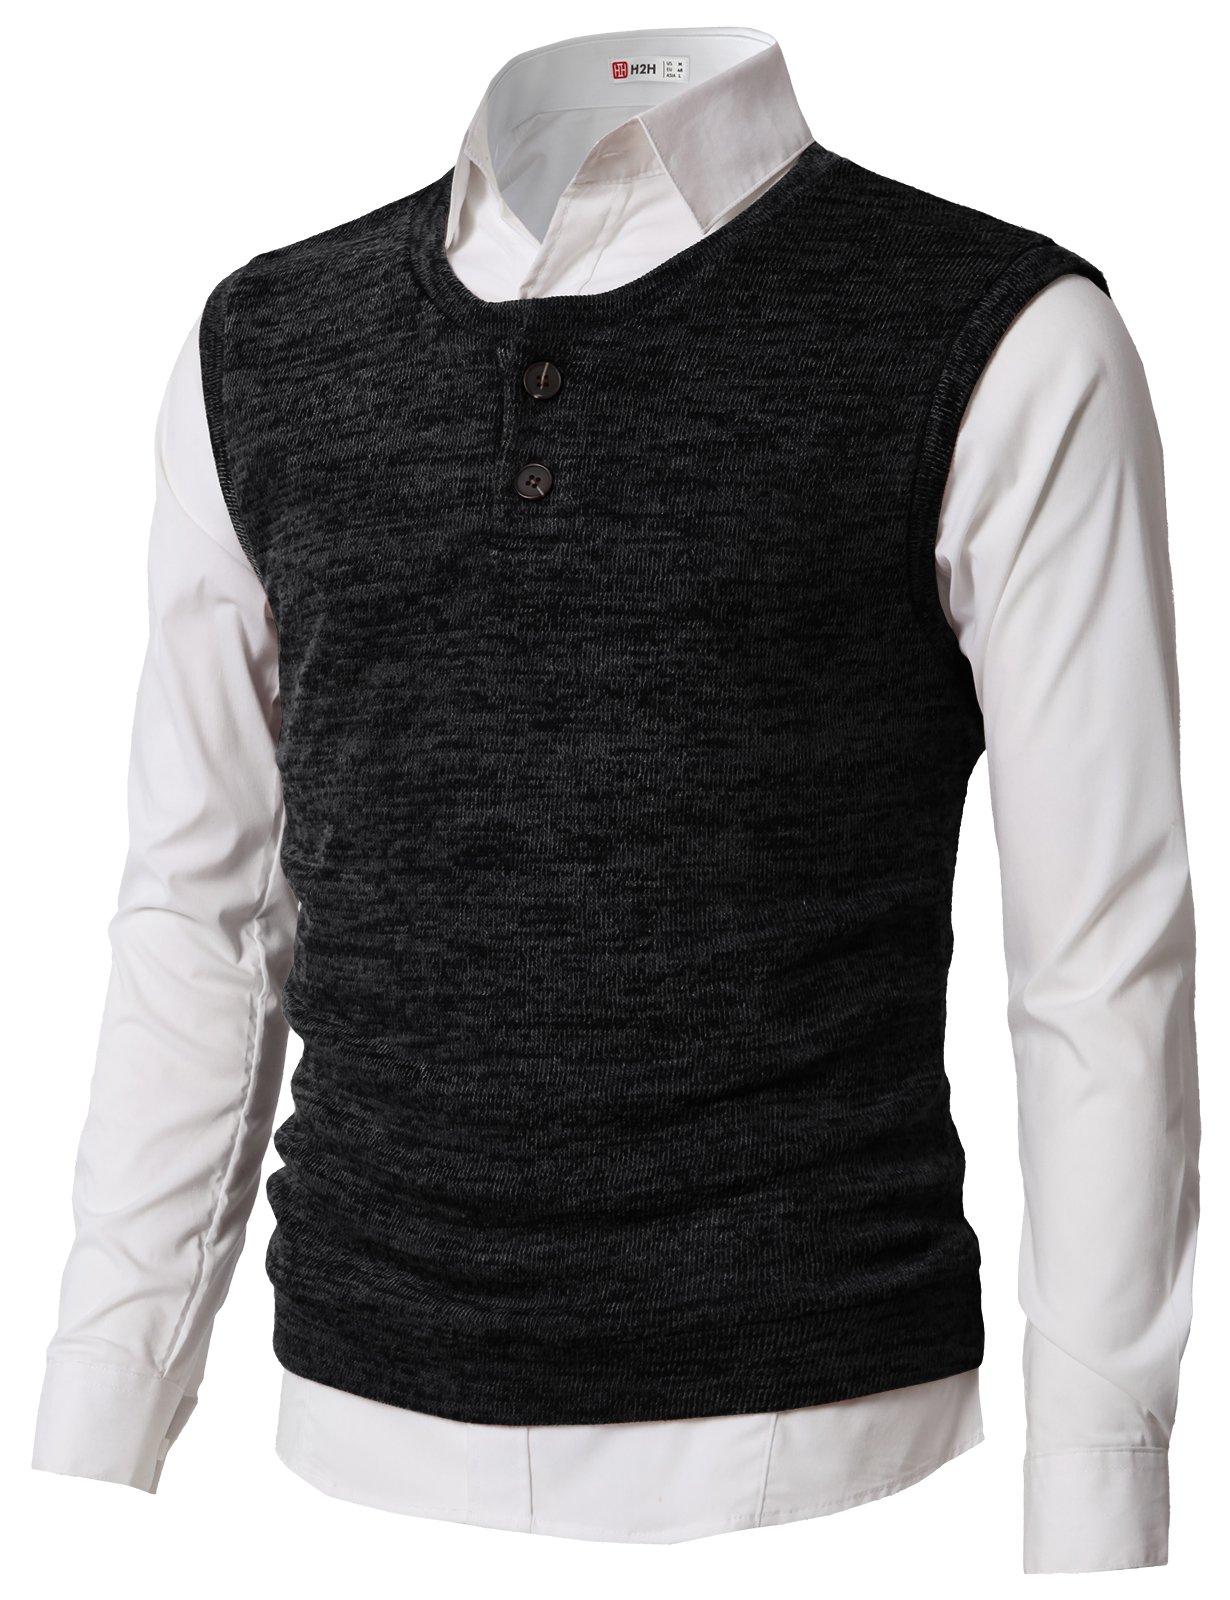 H2H Men's Solid Color Regular Fit U Neck Pullover Casual Sweater Vest Black US L/Asia XL (CMOV043)